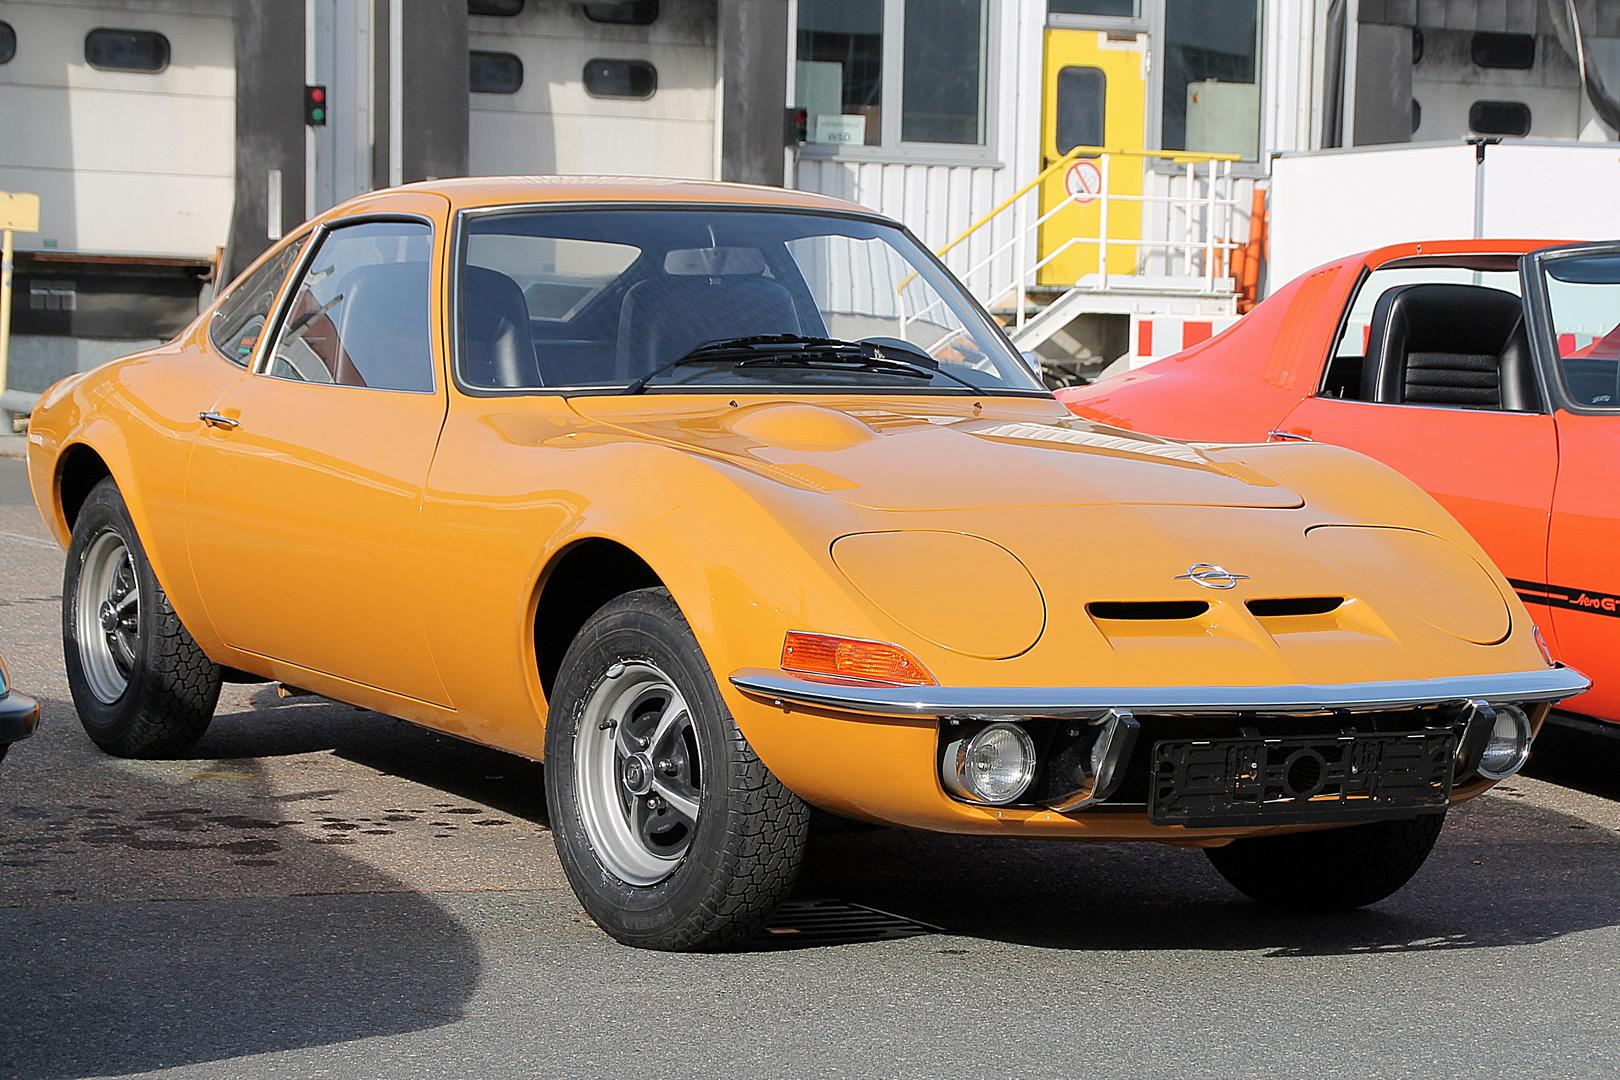 Besuch der Opel-Klassik-Werkstatt (7)